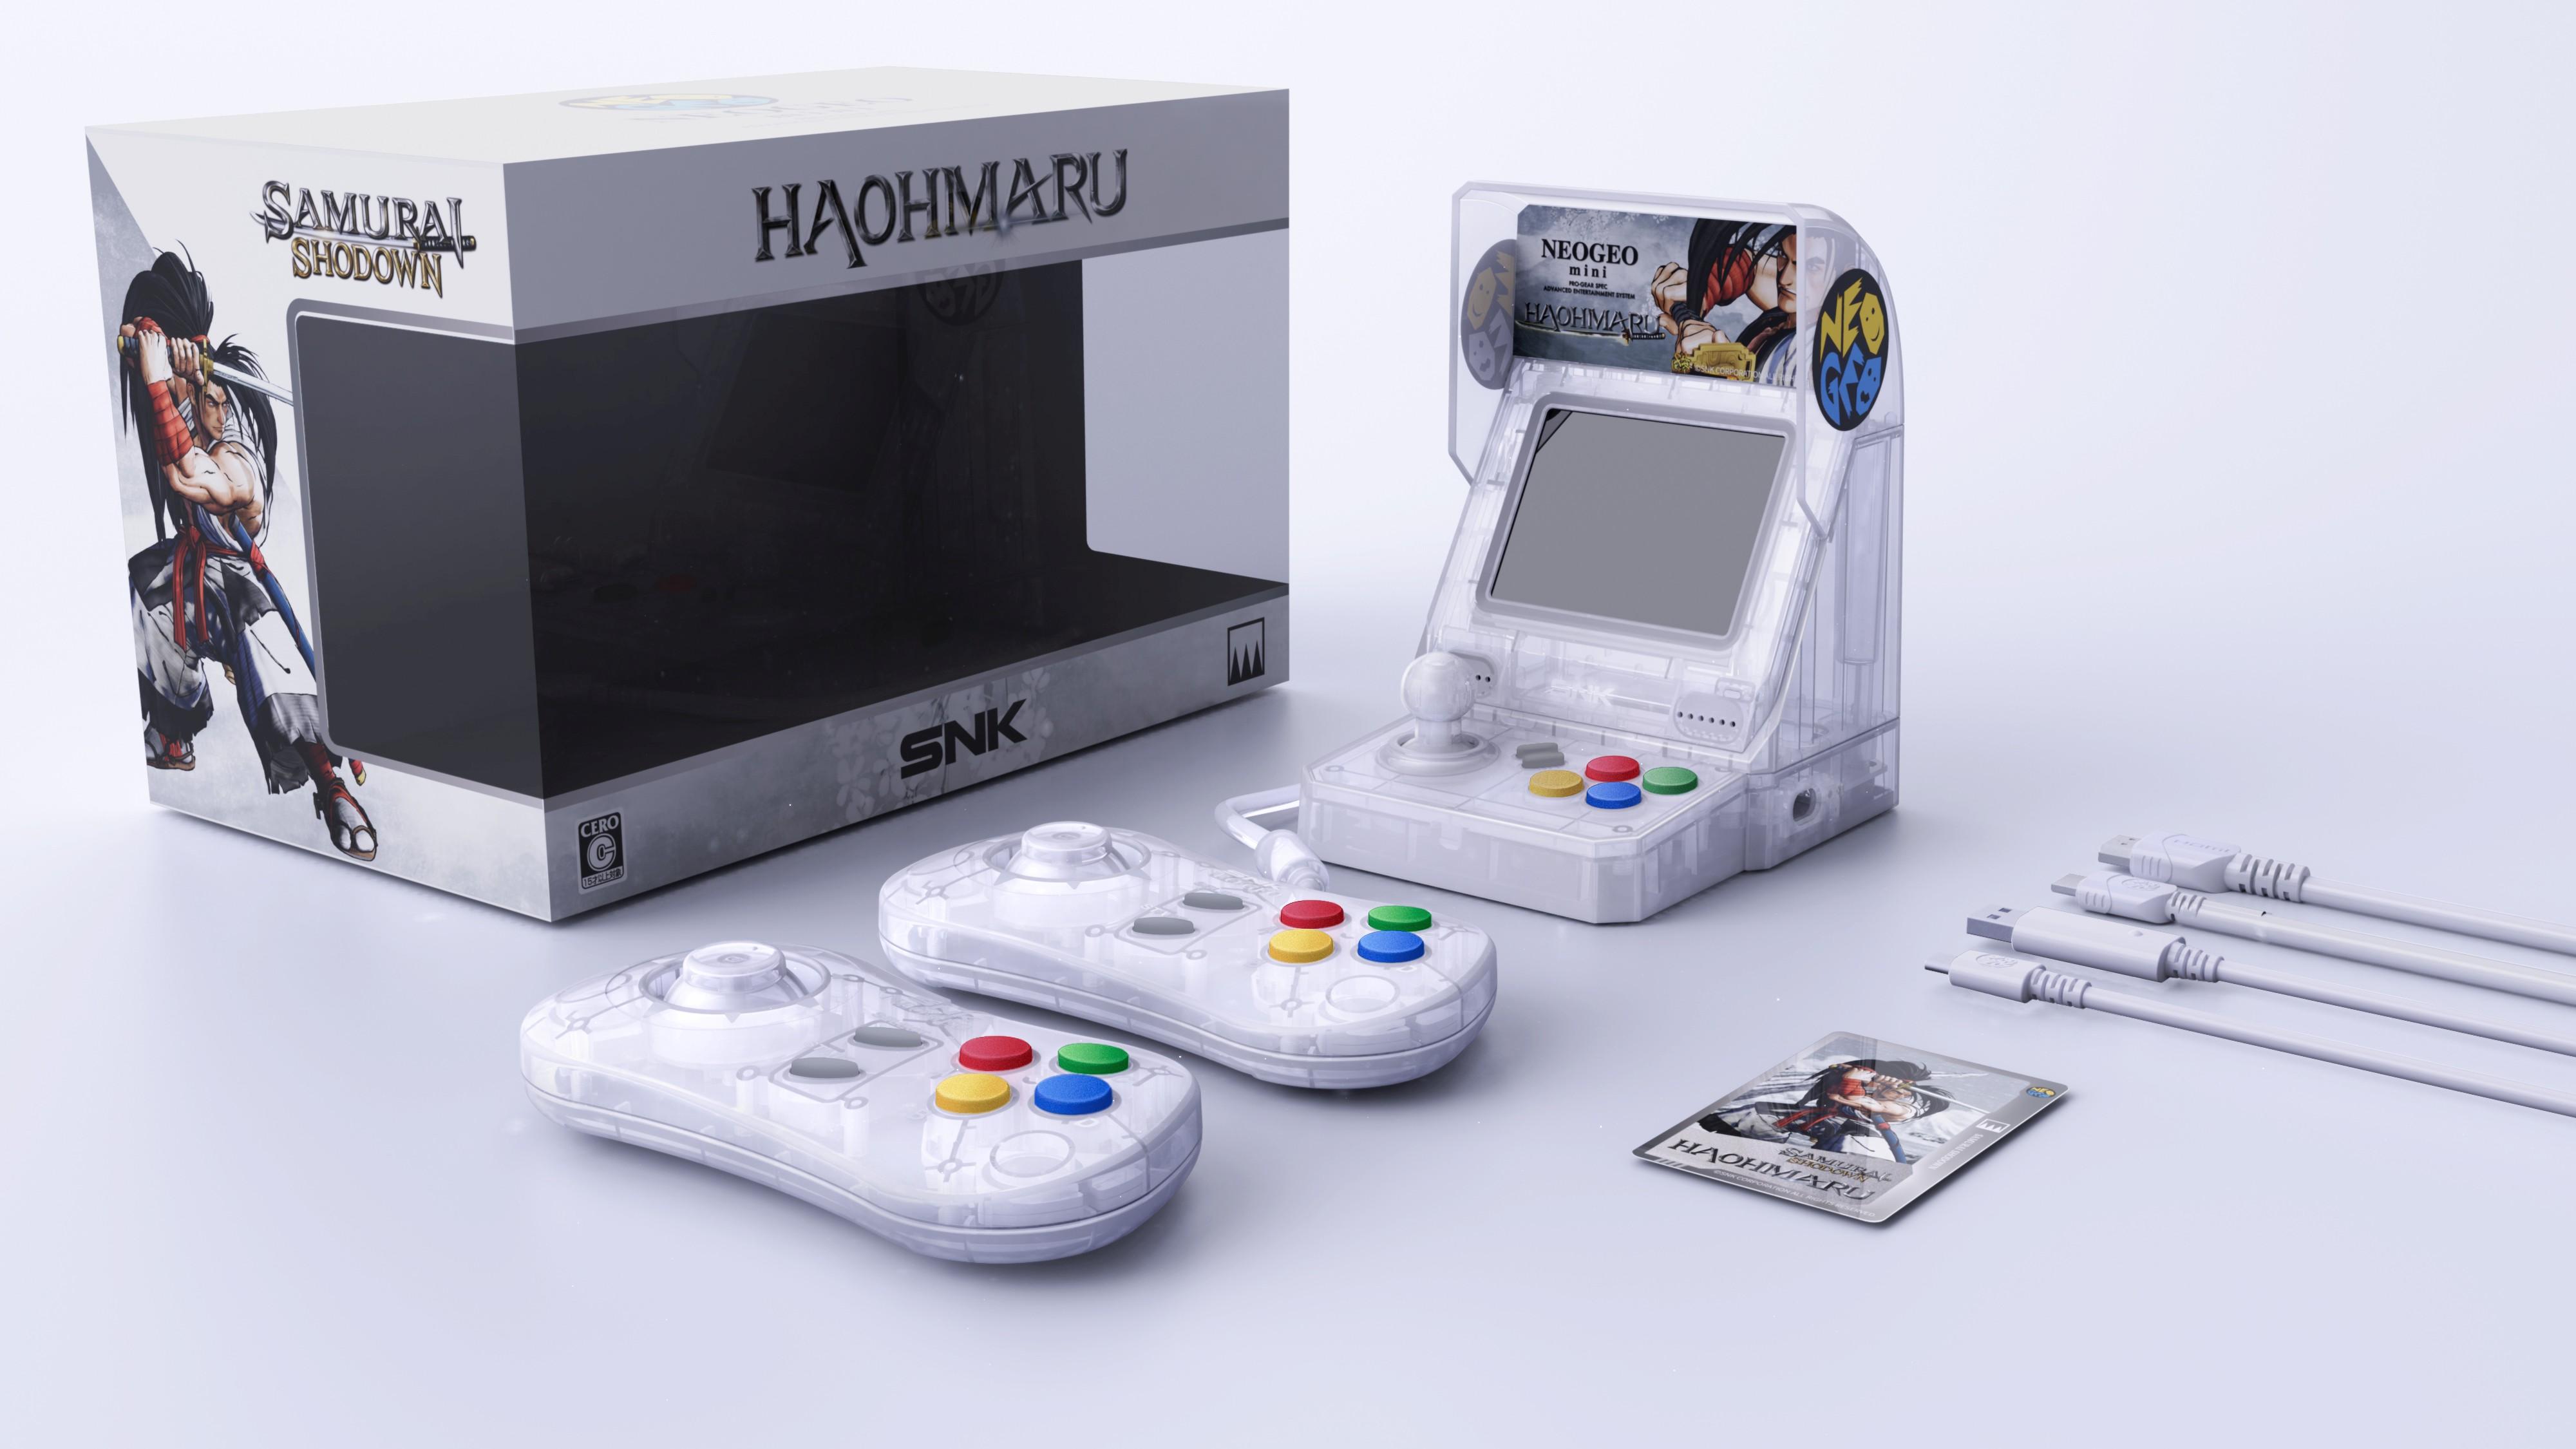 Neo Geo Mini Samurai Shodown Limited Set announced for Japan